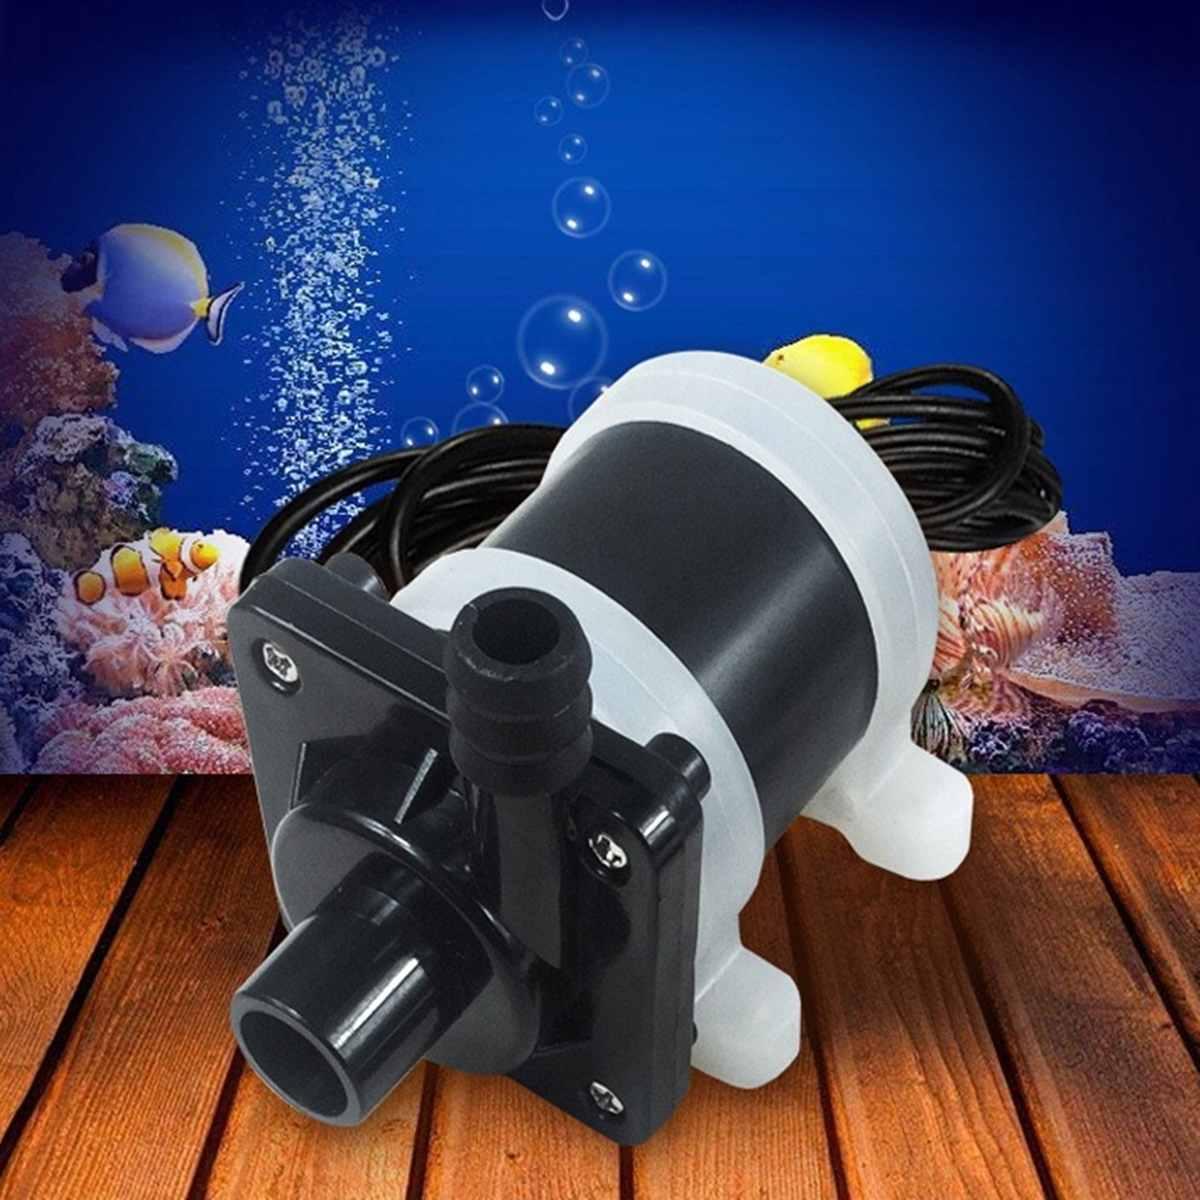 DC 12V 24V Solar Brushless Motor Submersible Pump Aquarium Air Oxygen Pump Pond Fish Tank Silent Water Filter Water Circulation